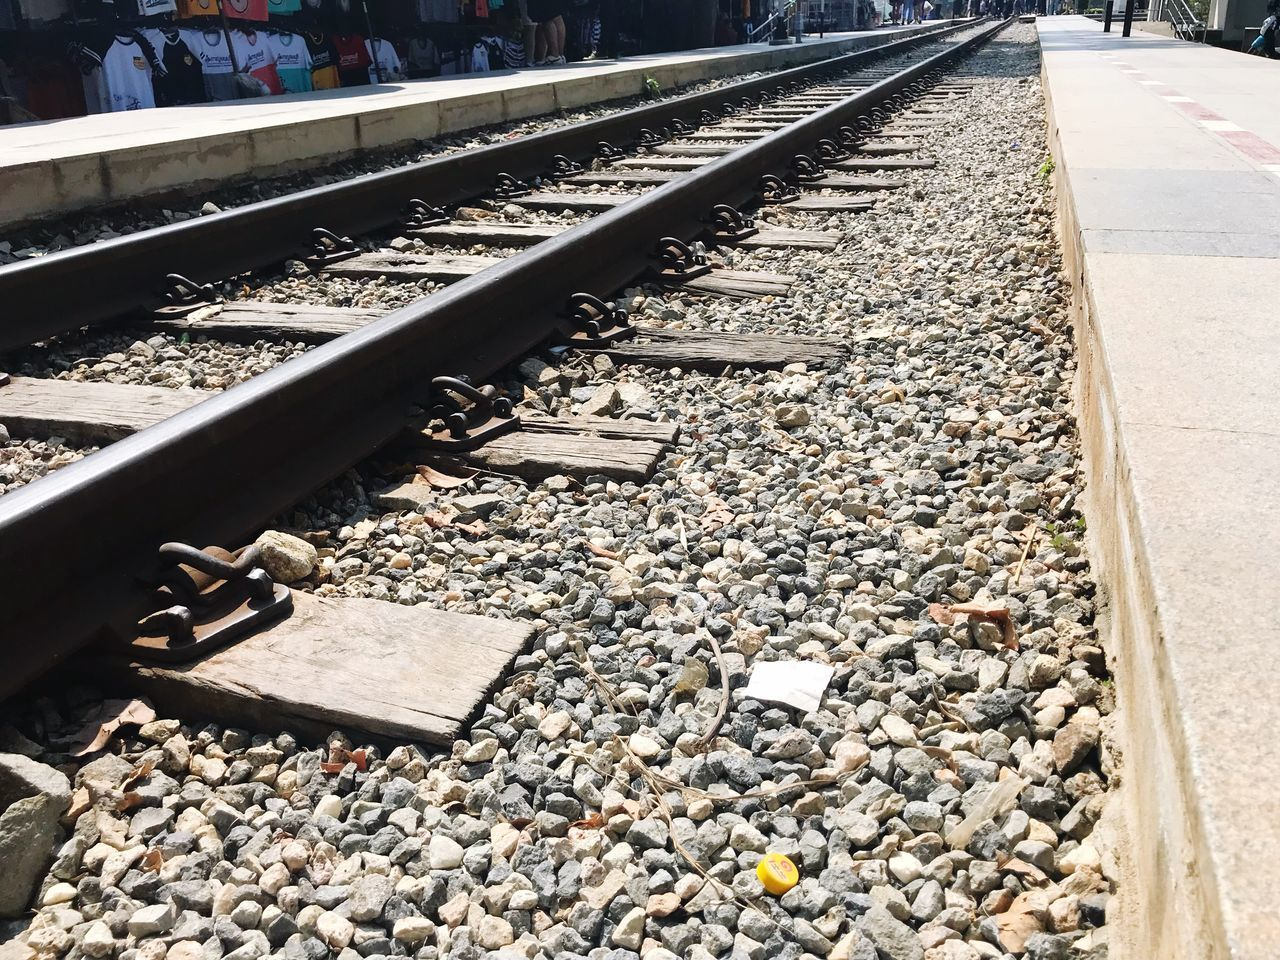 railroad track, rail transportation, railroad tie, transportation, day, metal, sunlight, outdoors, no people